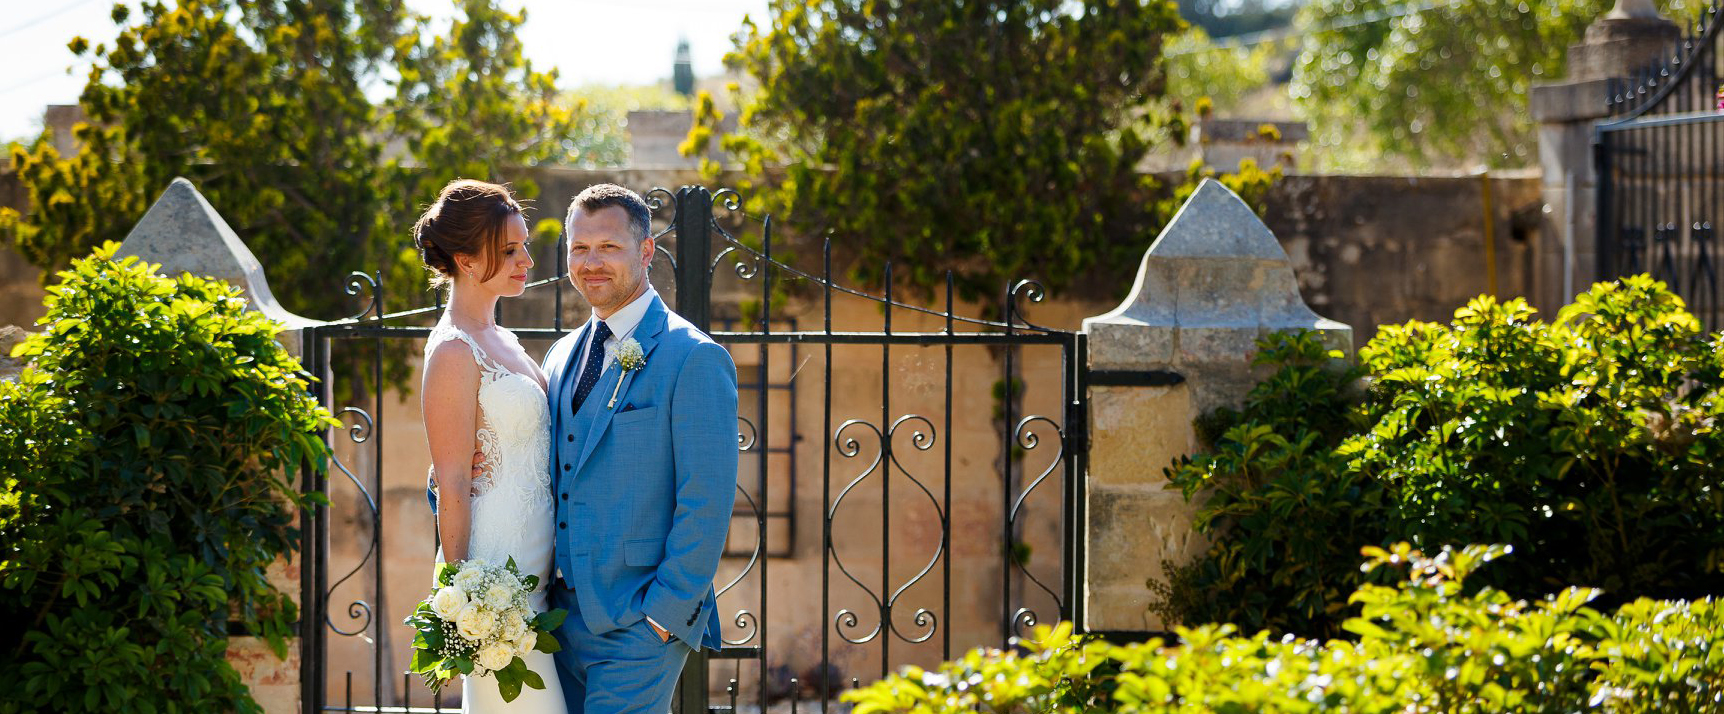 destination wedding malta videographer